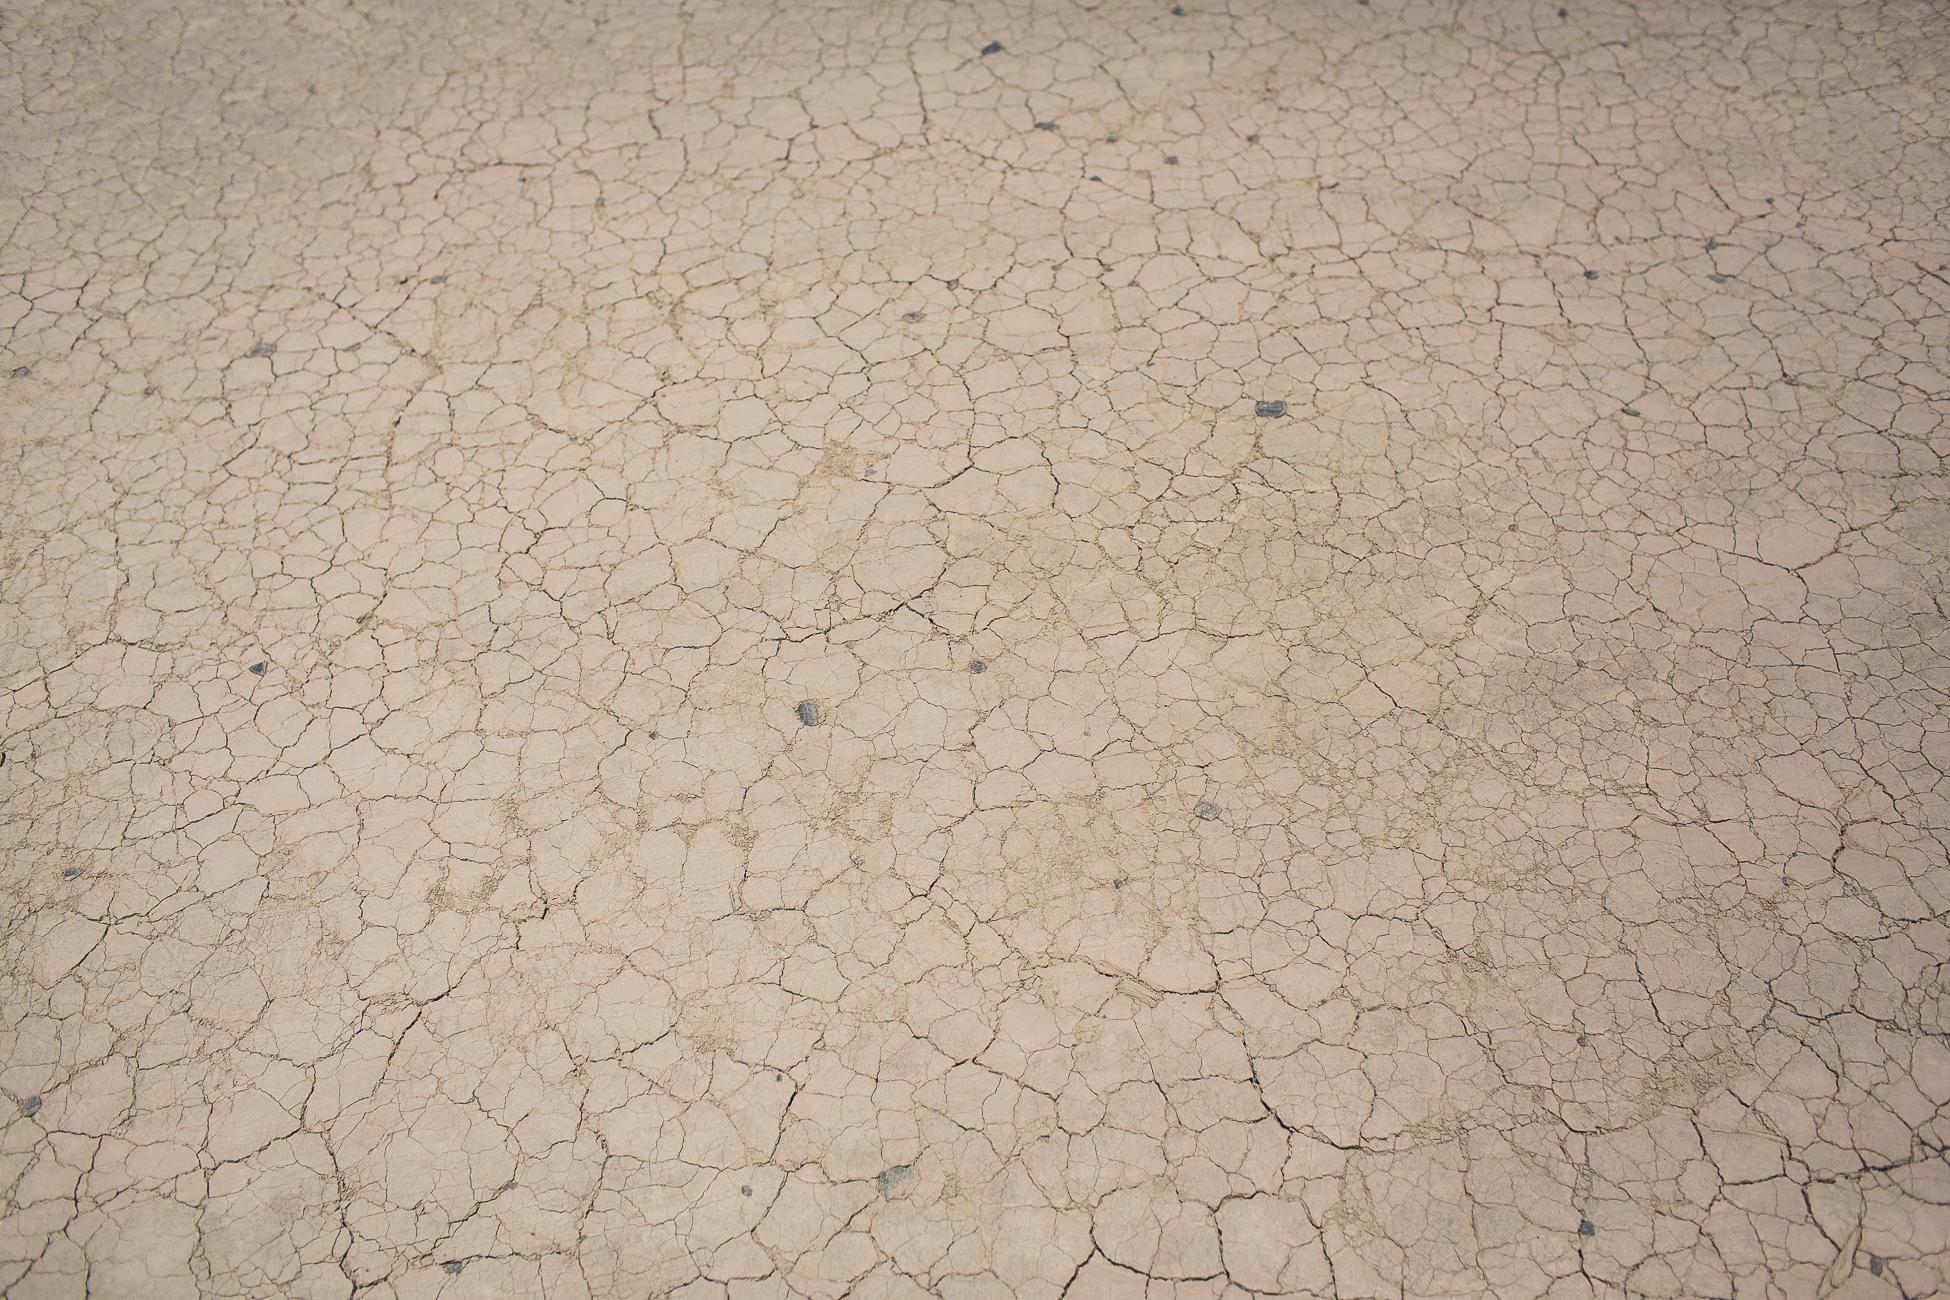 desktoglory_northern_argentina-111